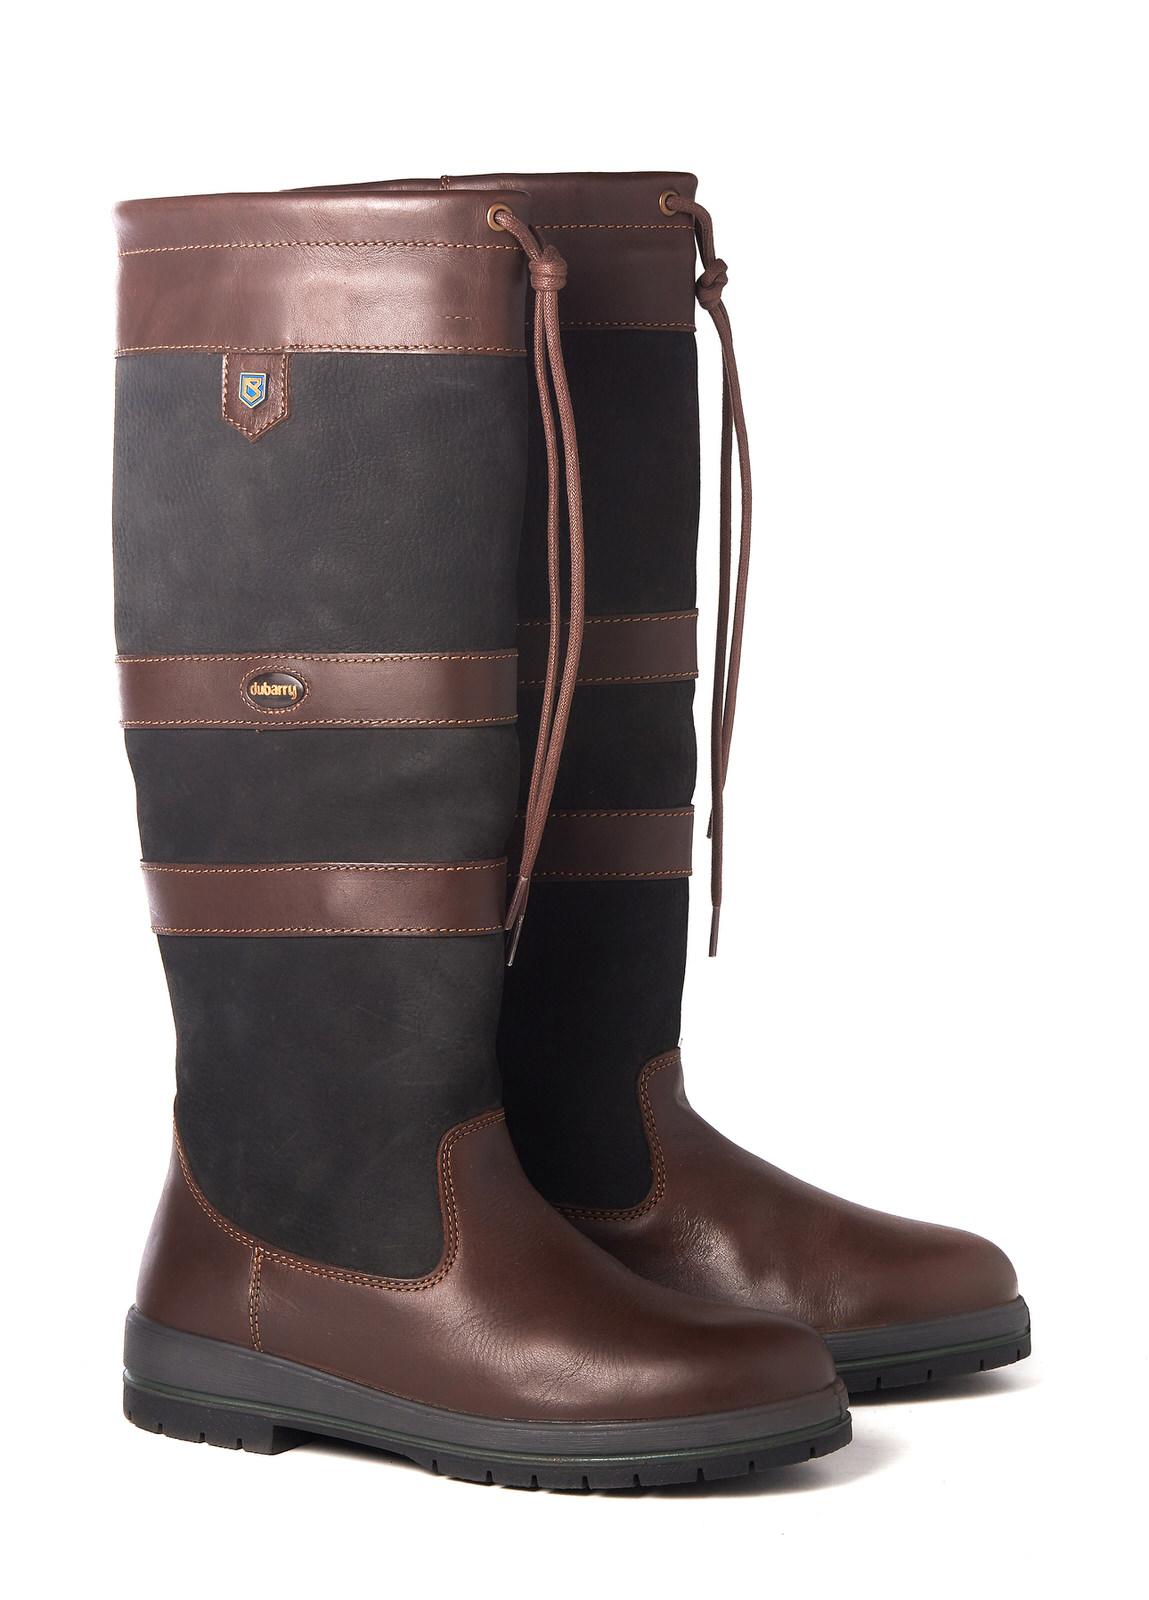 Galway SlimFit™ Country Boot - Black/Brown